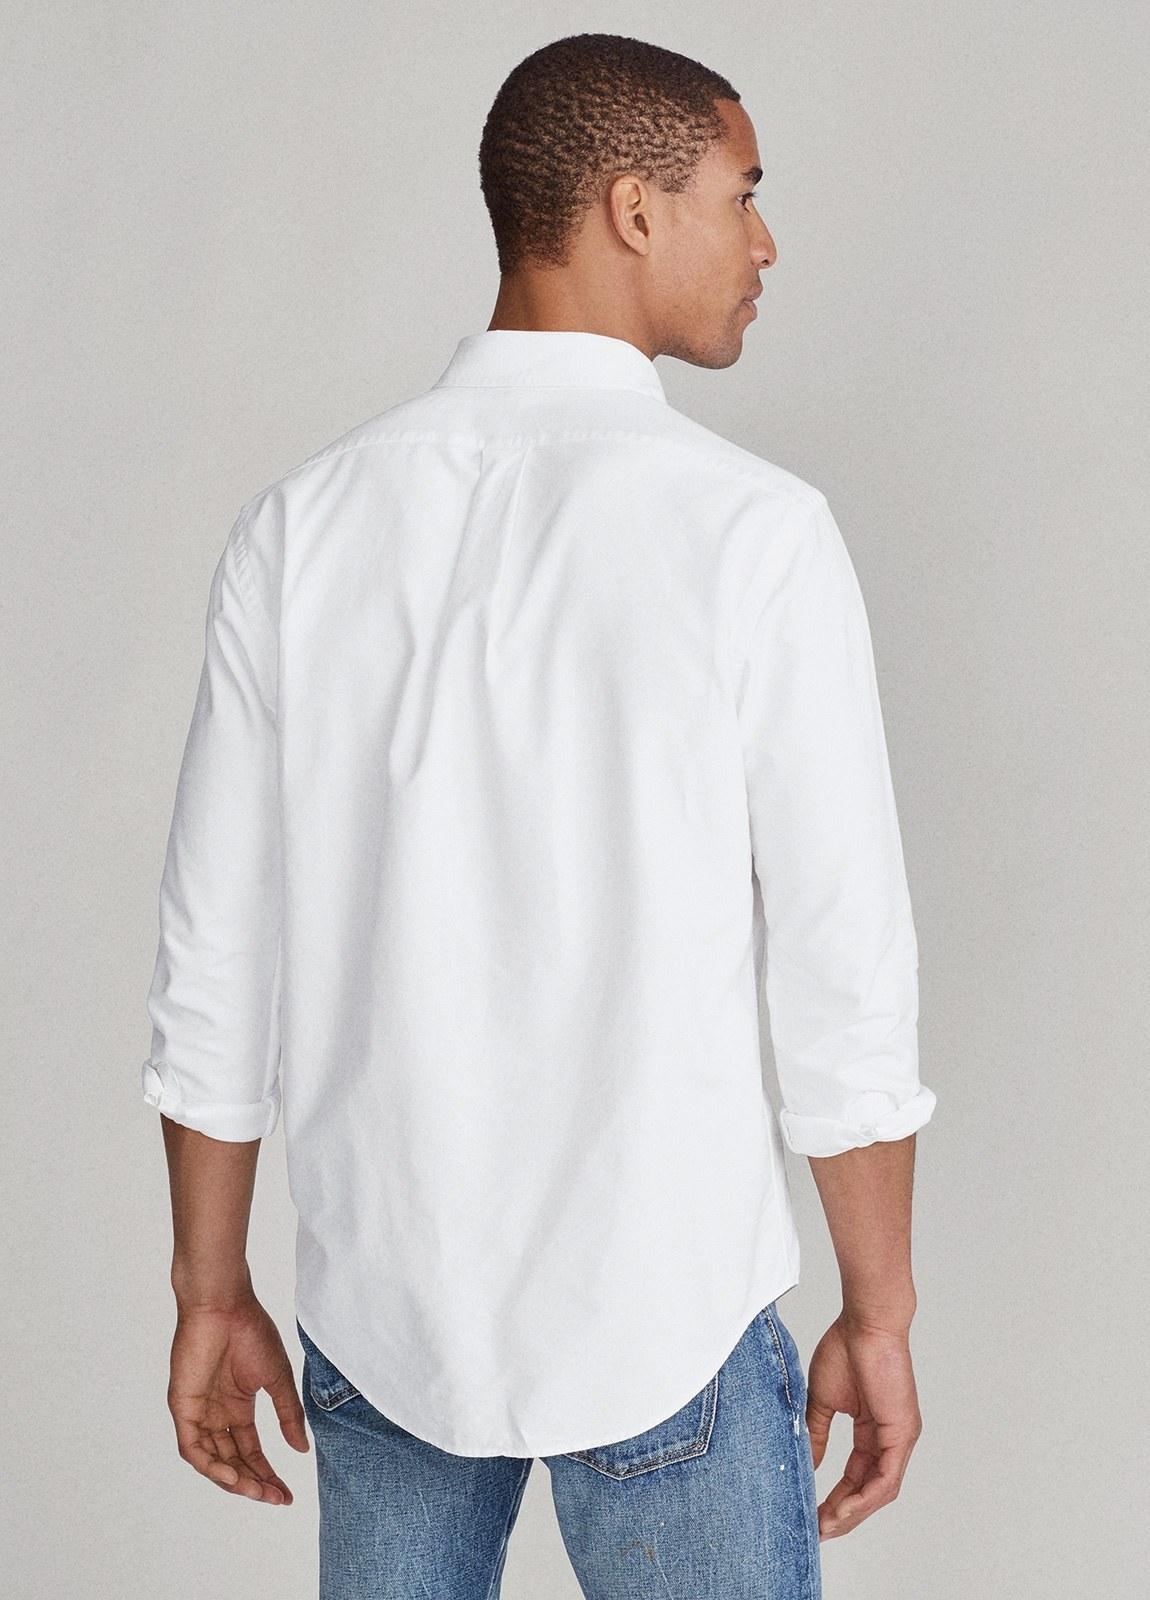 Camisa POLO RALPH LAUREN oxford color blanco - Ítem1